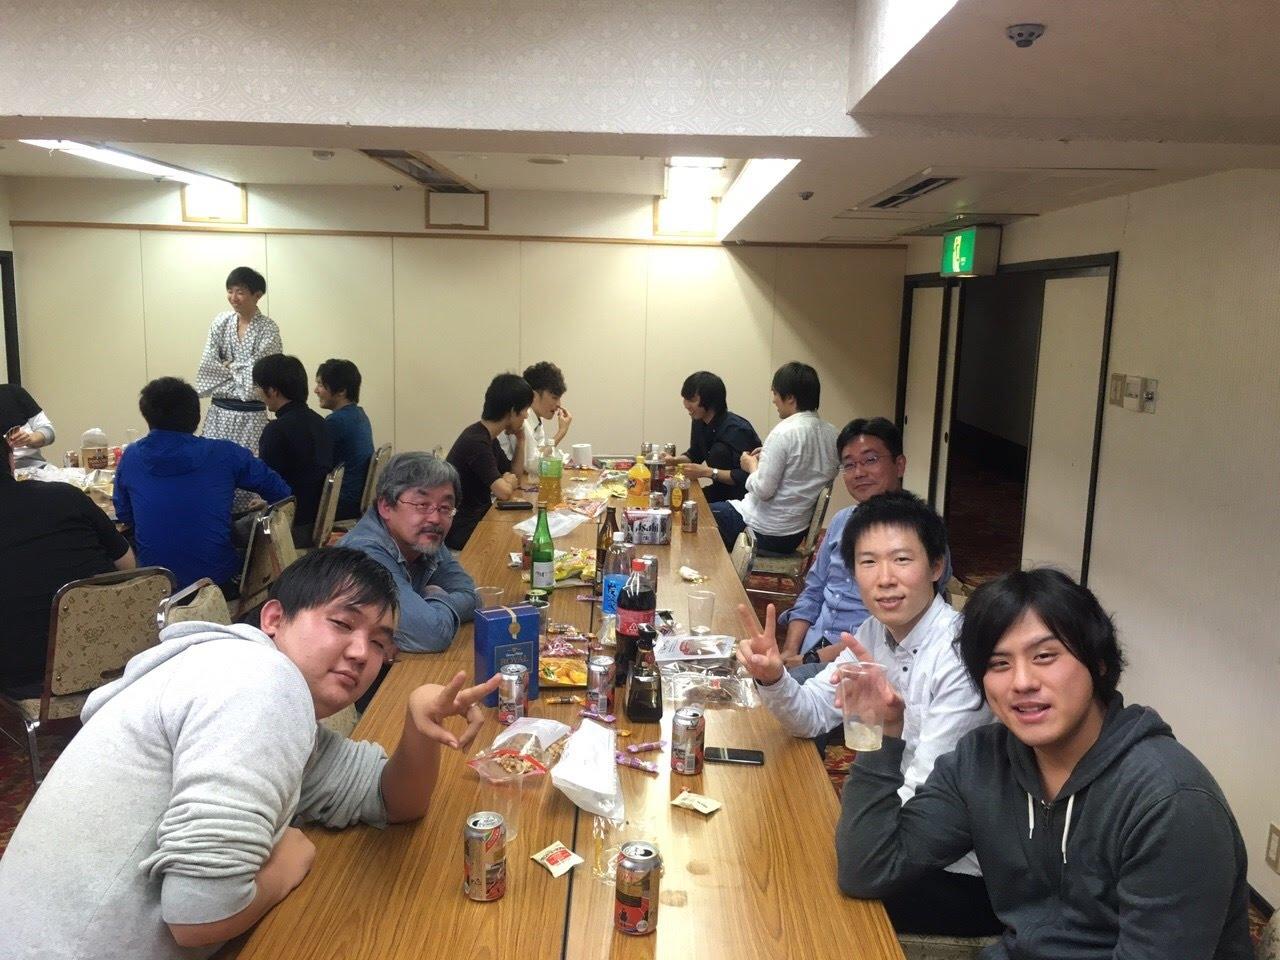 https://4310b1a9-a-c2f1267d-s-sites.googlegroups.com/a/yoshida-agu.net/home/dairy-of-yoshida-lab/20151178/nomi1.JPG?attachauth=ANoY7cq5p5hEOCeCgzL3GgPgg9J_qpXWYuS0XhVecC5AZA4GDdipkmuDJXJIfzx3QAp35iBmHrIjAl7MKFSSfGhAALnLDeXX1VzAWCr4AOIeXK7F4_SEOC4ZJBxp8Md3JyB7_uIKd59aaX6diQ3V1jwQtX1CGRrbRYQUVuWly6uSyW1zEmVqXvxShY4-a80uAUUTZu1U1hdecVa6hVQSB4Ey8Oz51w90bjgq-i7efiP94ZSTJ2K1mgoMvhwvgS3FmheGW8GzRr1T&attredirects=0